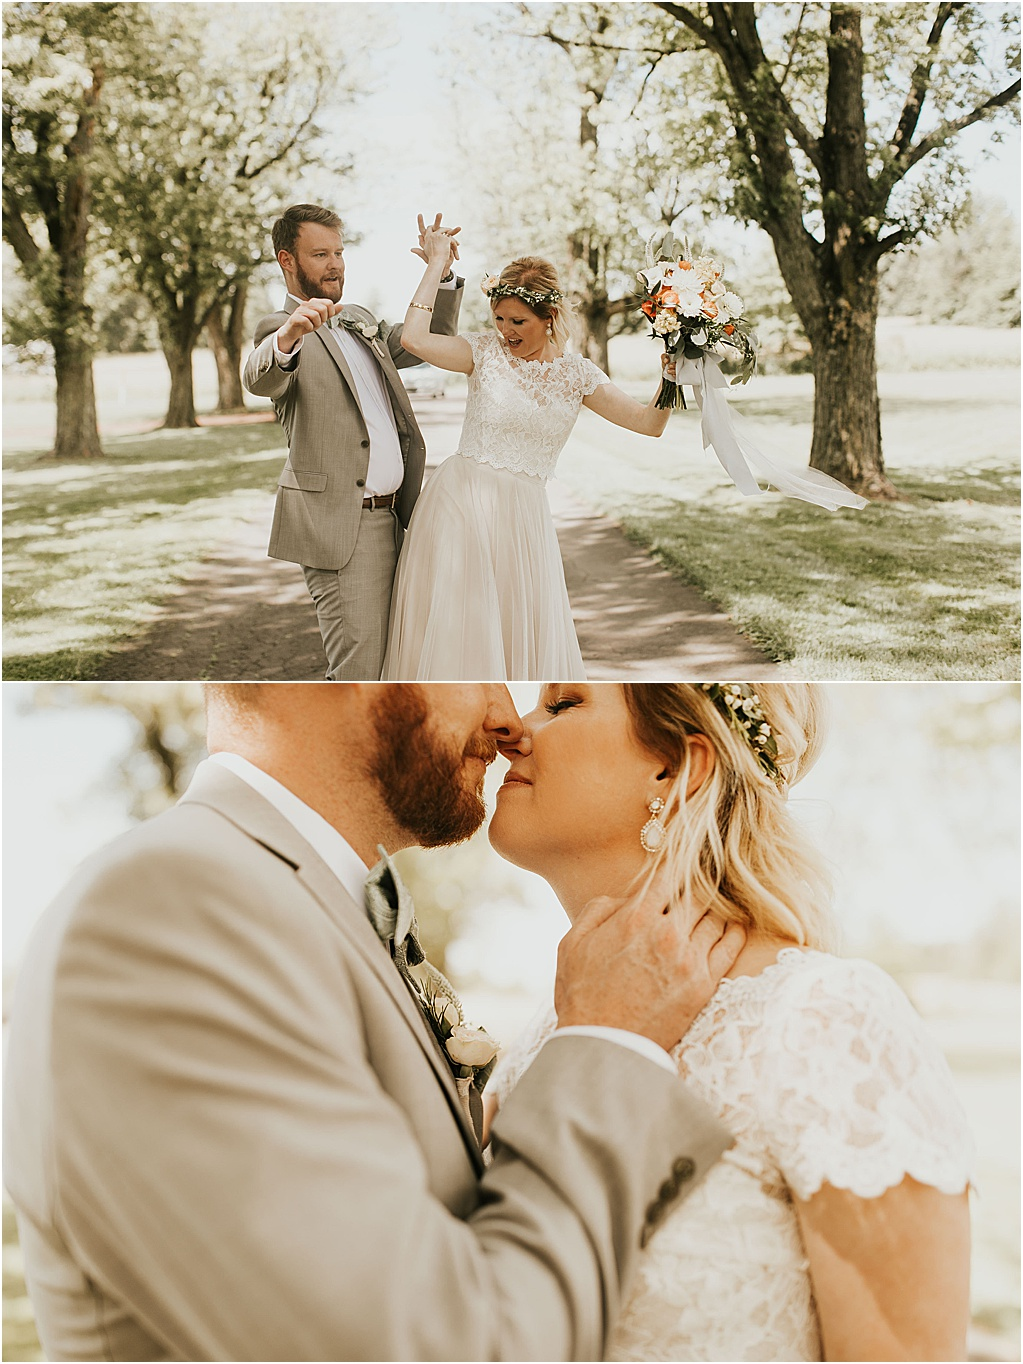 brittany_boote_pennsylvania_wedding_photographer_0433.jpg